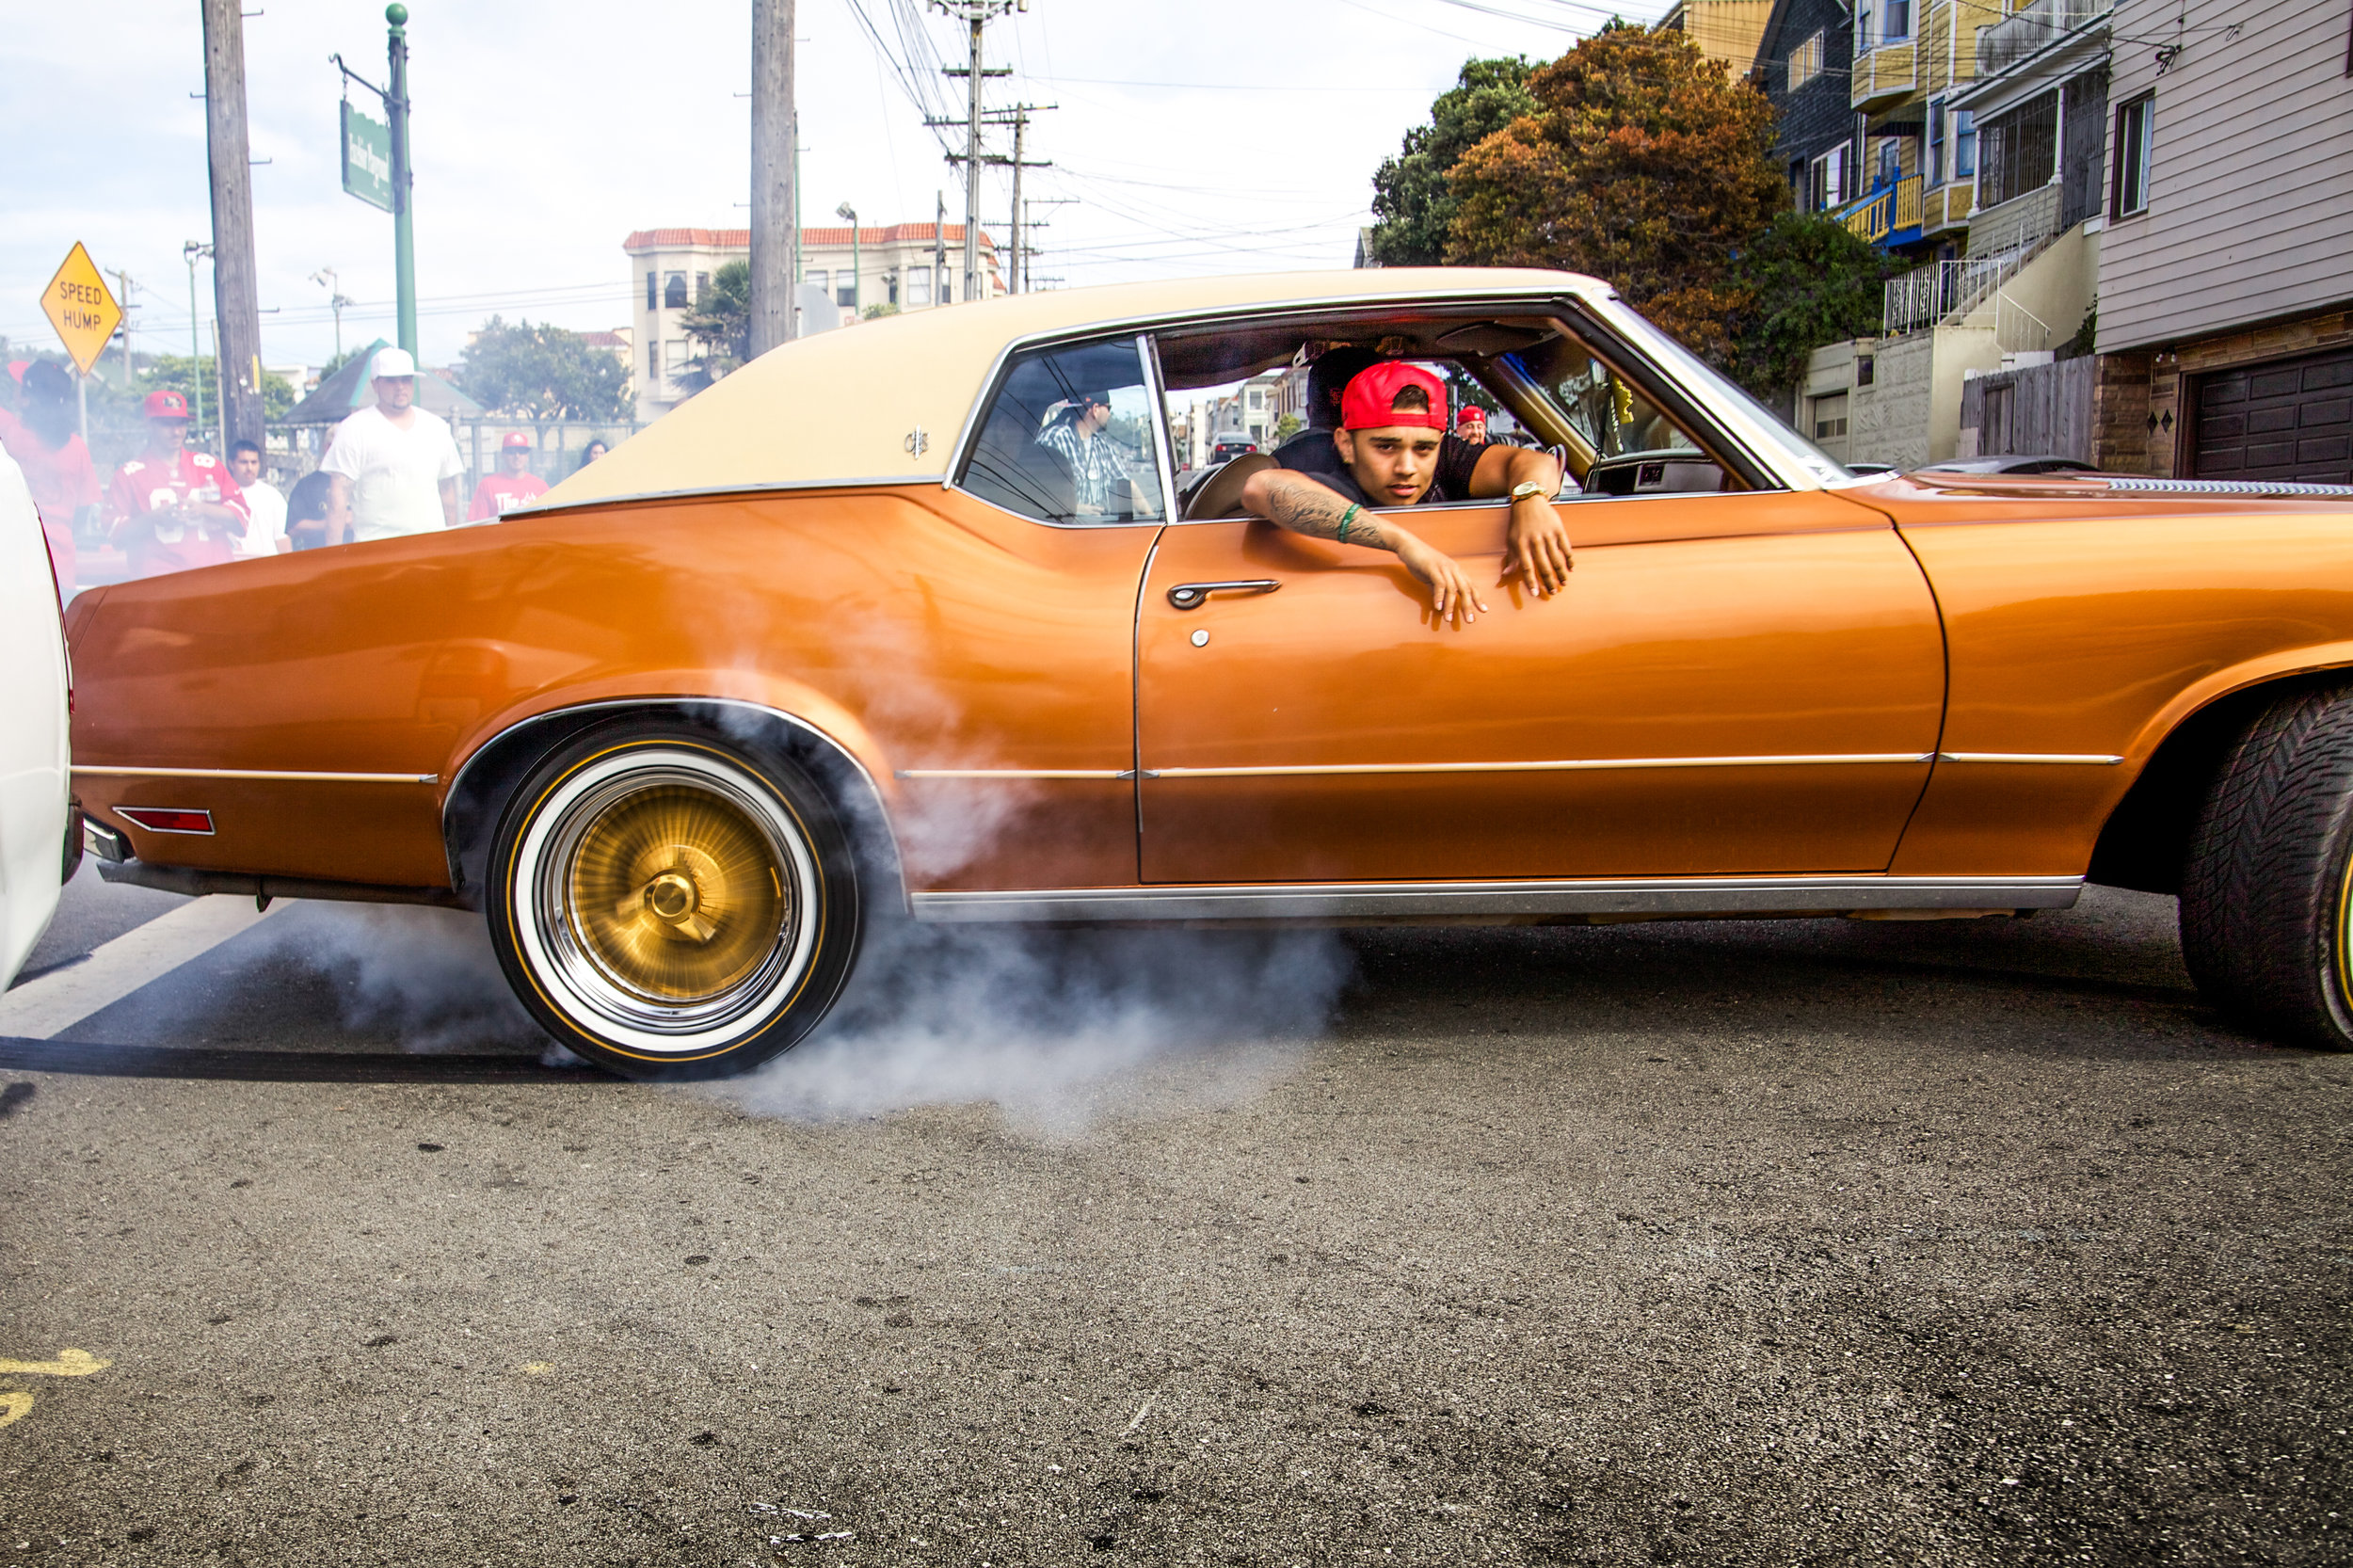 © Everyday Bay Area Photographer Rasta Dave